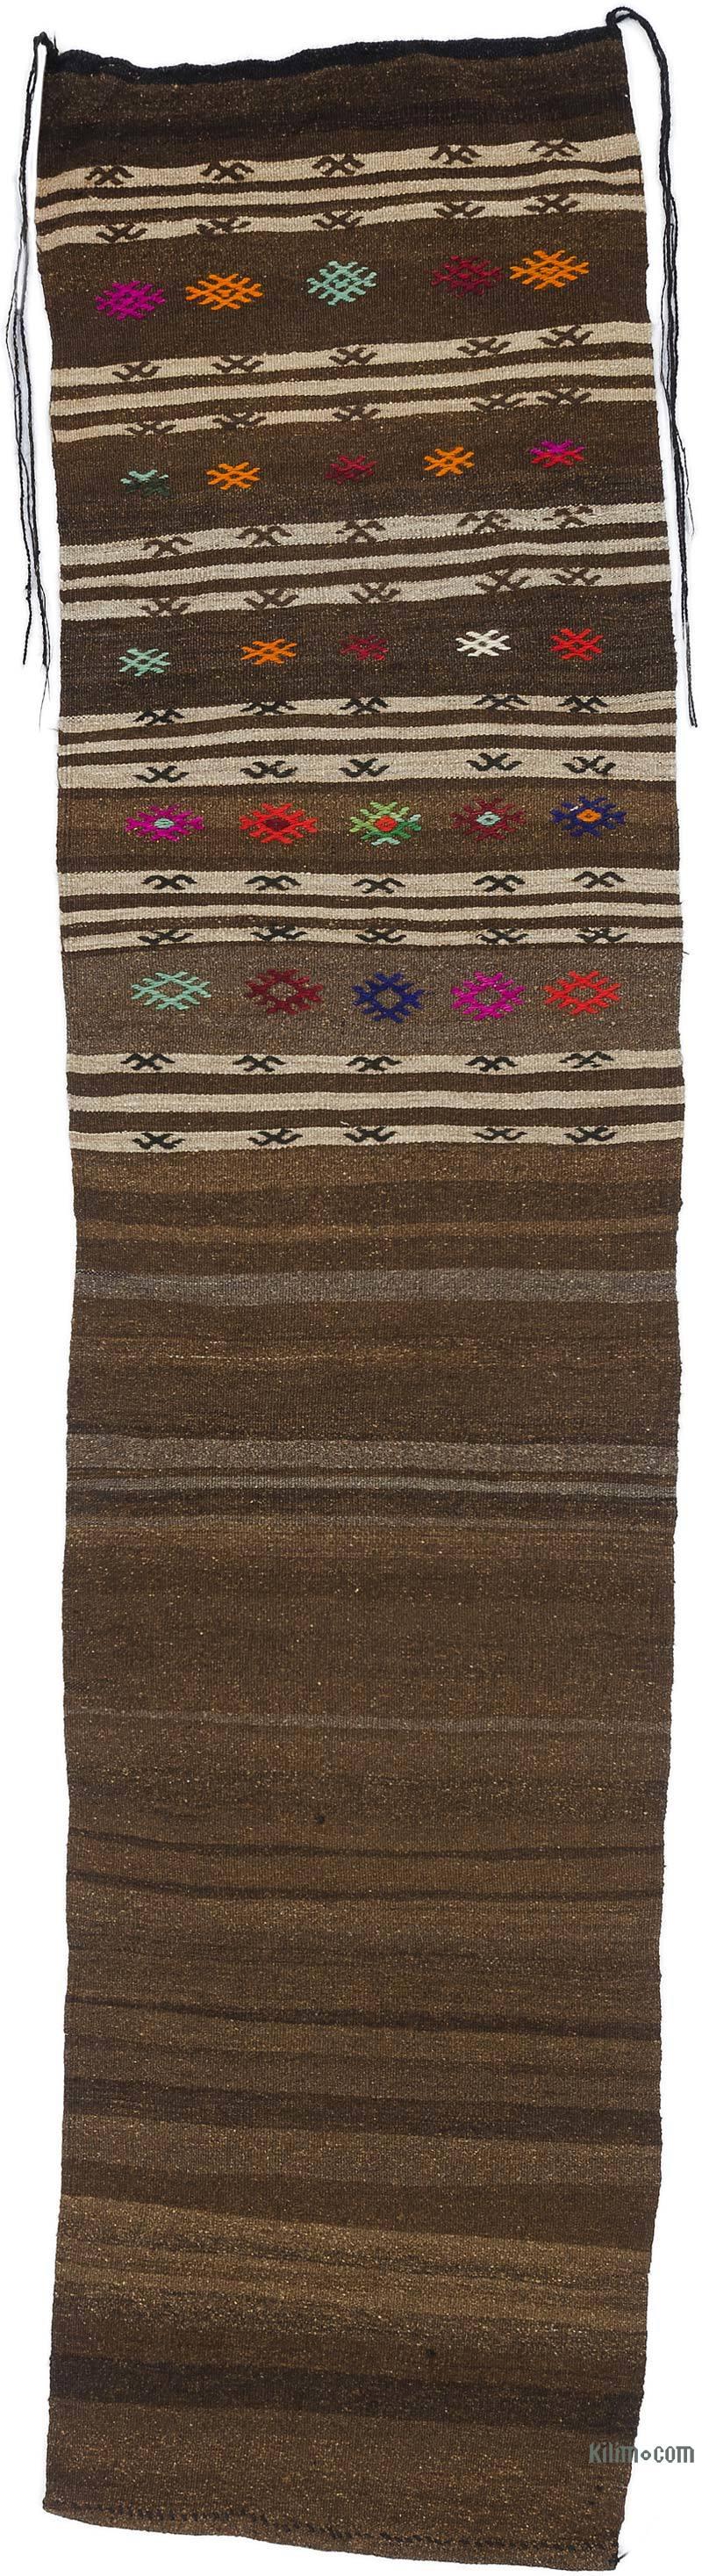 "Brown Vintage Turkish Kilim Runner - 2' 2"" x 9'  (26 in. x 108 in.) - K0018607"